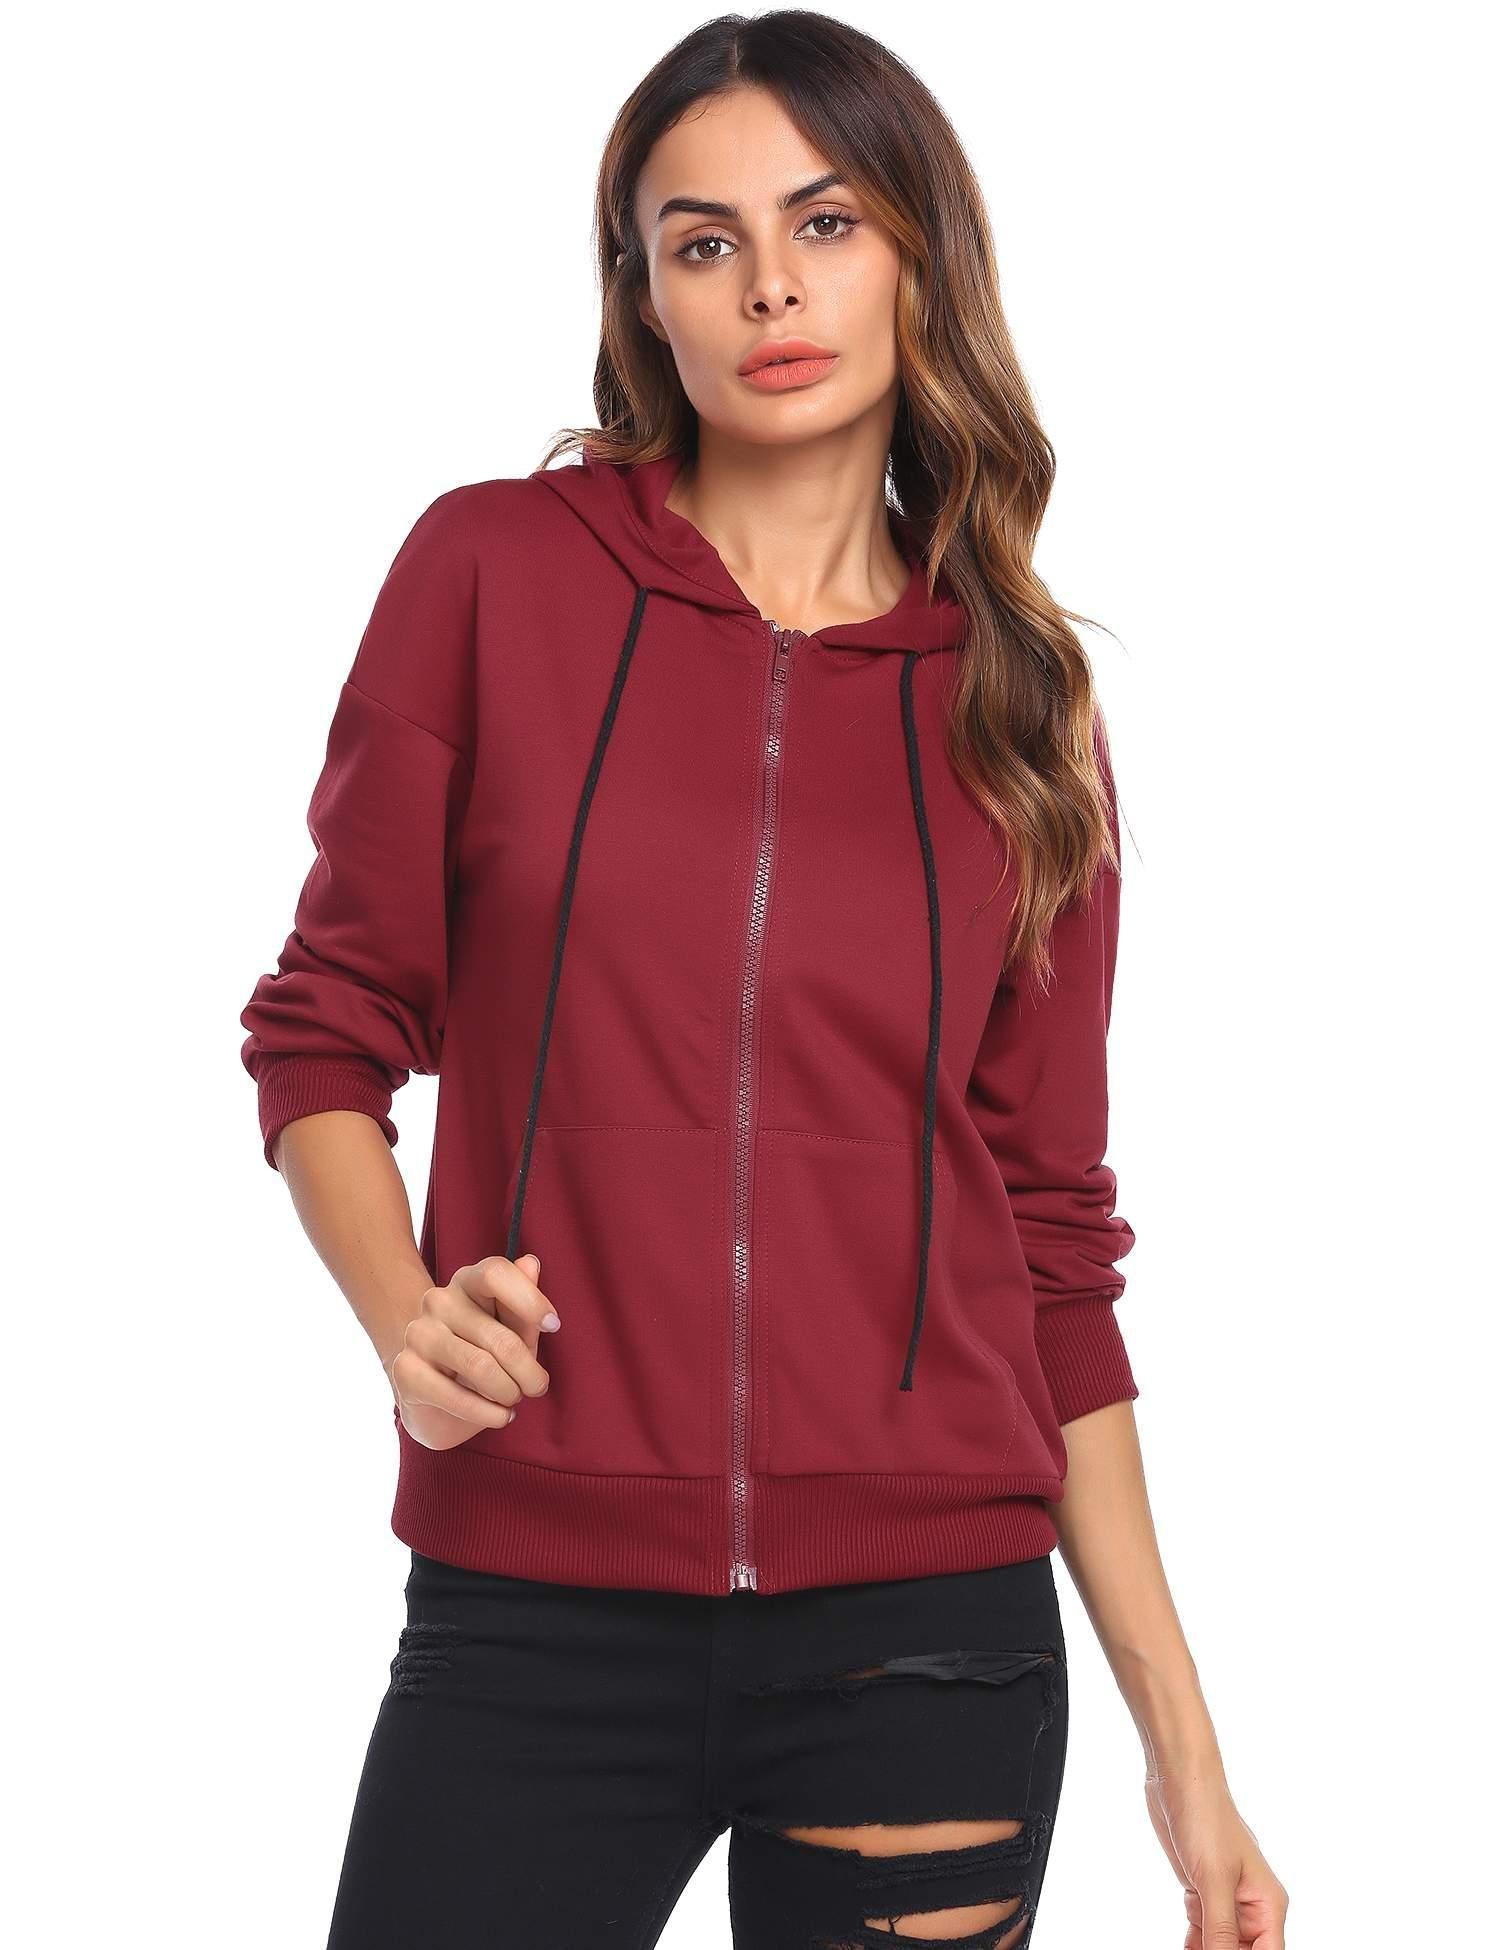 ELESOL Womens Active Regular Fit Long Sleeve Zip up Hoodie Sweatshirt Red,S